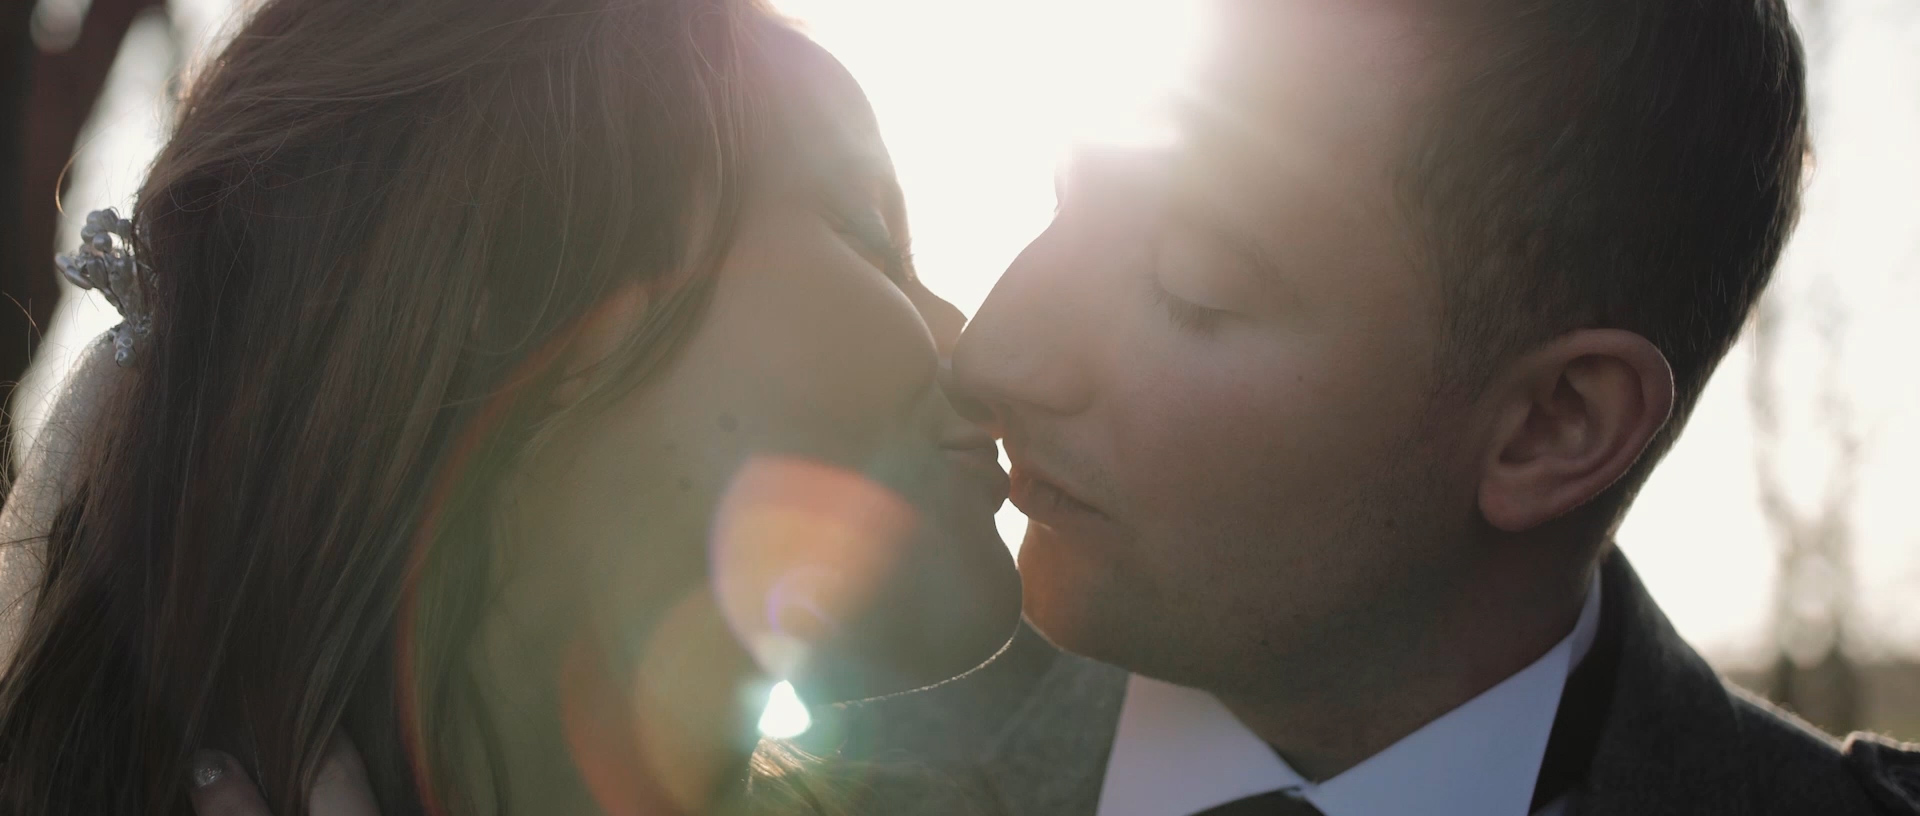 sloans-wedding-videographer_LL_03.jpg